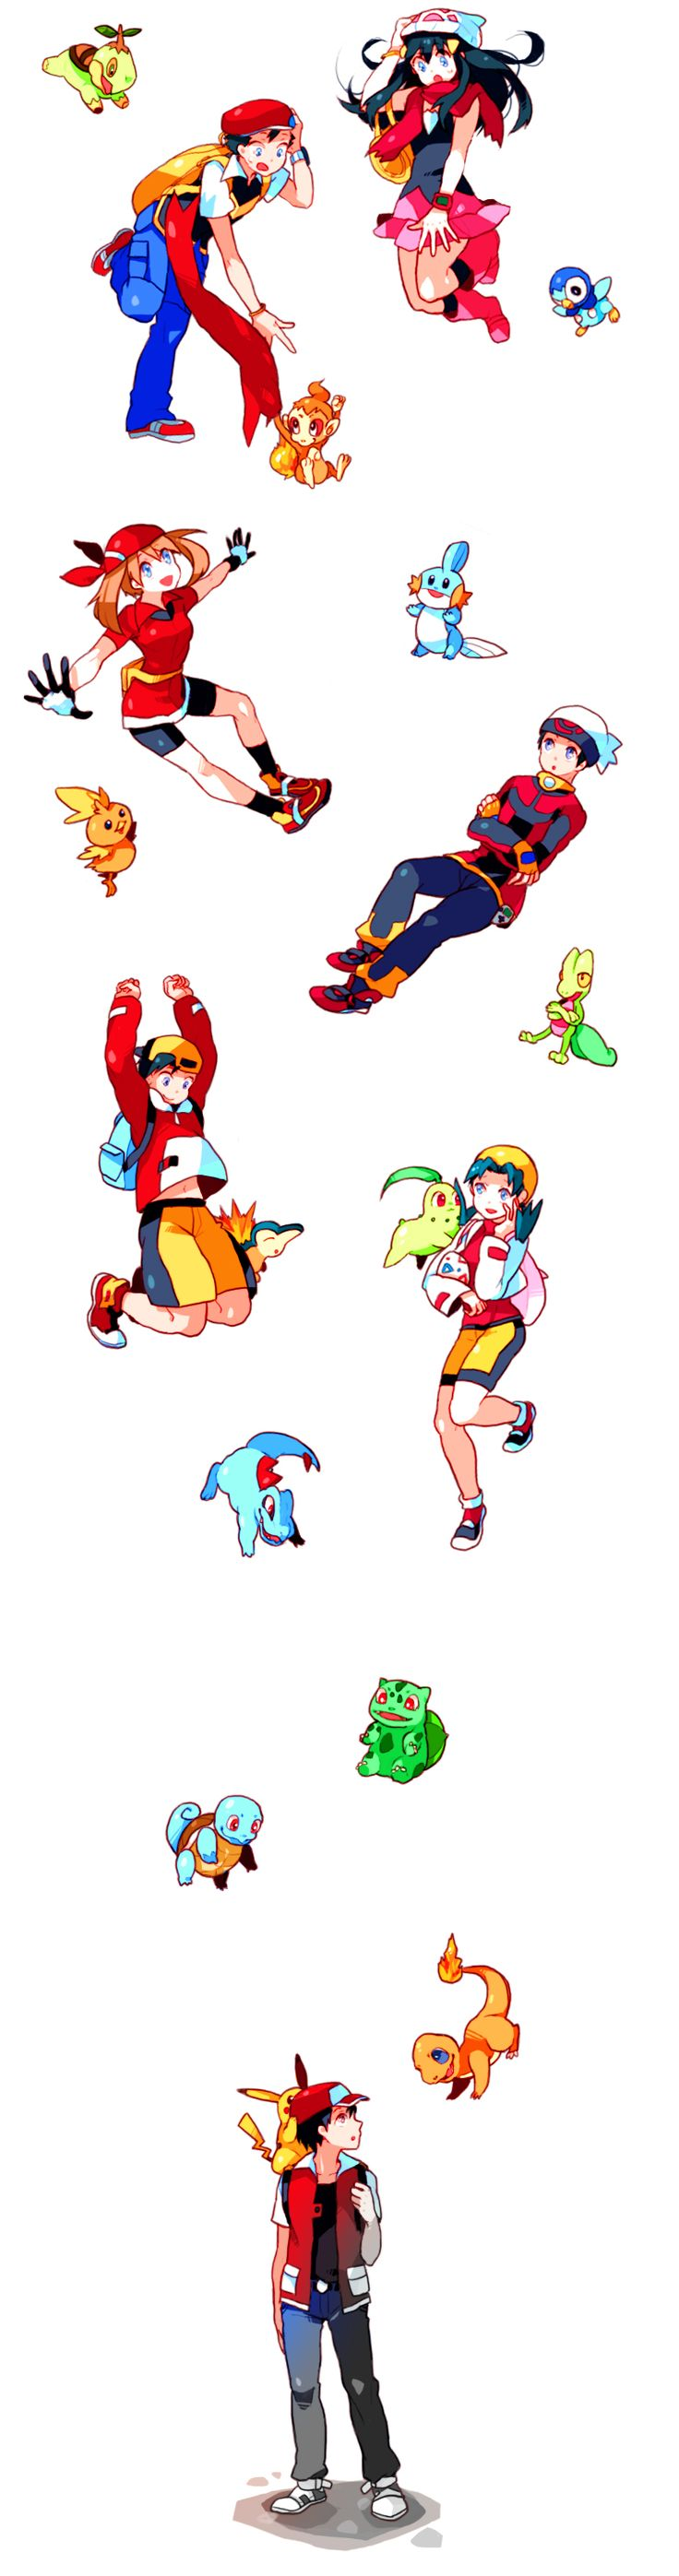 Turtwig, Chimchar, Piplup, Dawn/Hikari (Pokémon), Diamond (Pokémon), May/Haruka (Pokémon), Ruby (Pokémon), Torchic, Mudkip, Treecko, Gold (Pokémon), Crystal (Pokémon), Cyndaquil, Chikorita, Totodile, Bulbasaur, Squirtle, Charmander, Red (Pokémon), Pikachu (by Dada, Pixiv Id 76218)